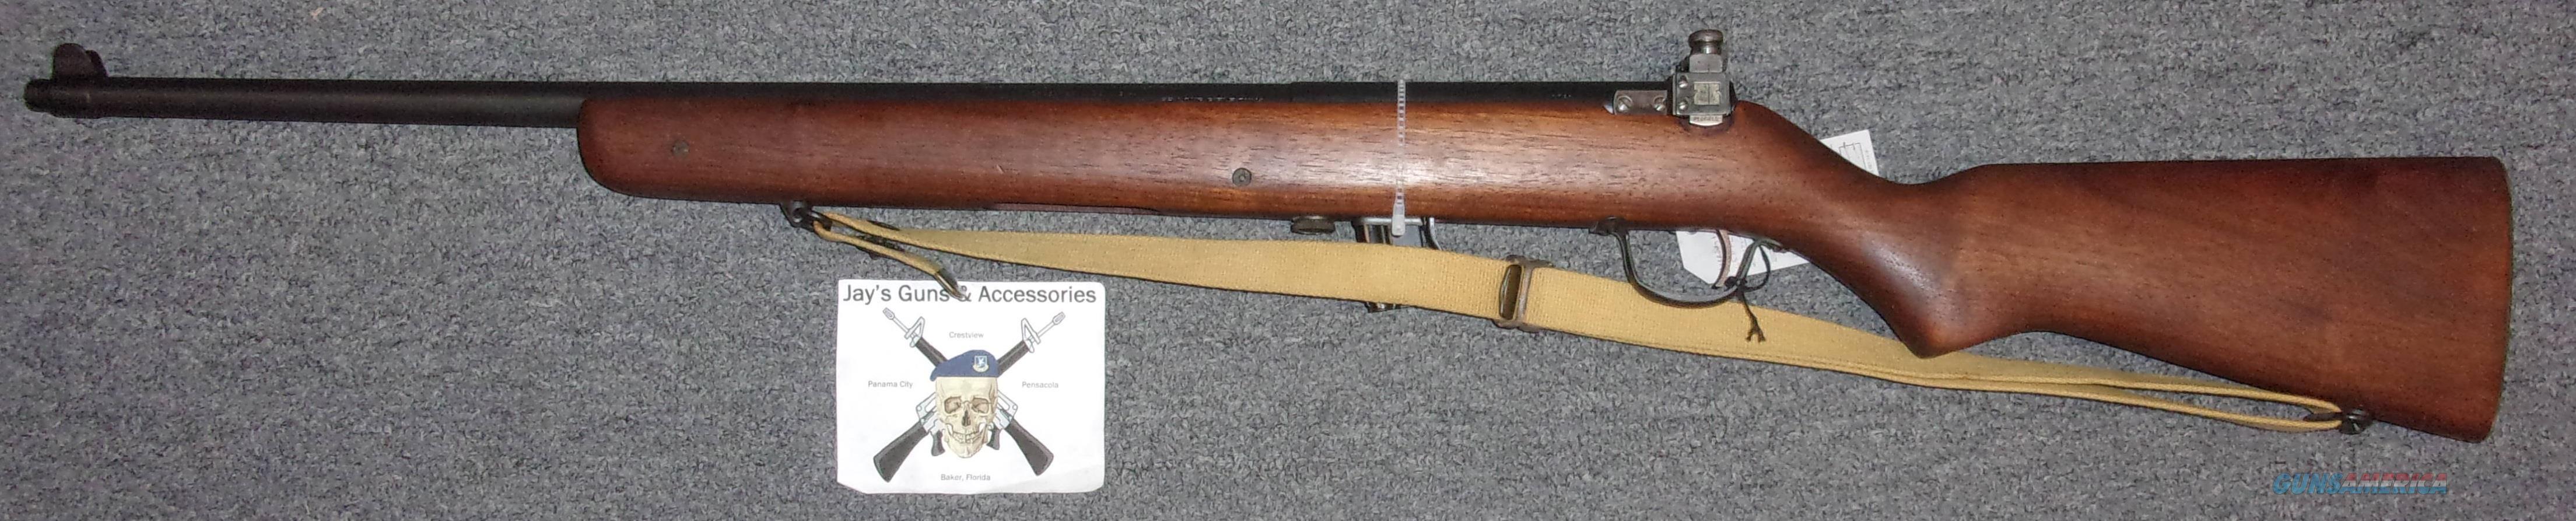 Harrington & Richardson Arms Co. 65 H&R Reising  Guns > Rifles > Harrington & Richardson Rifles